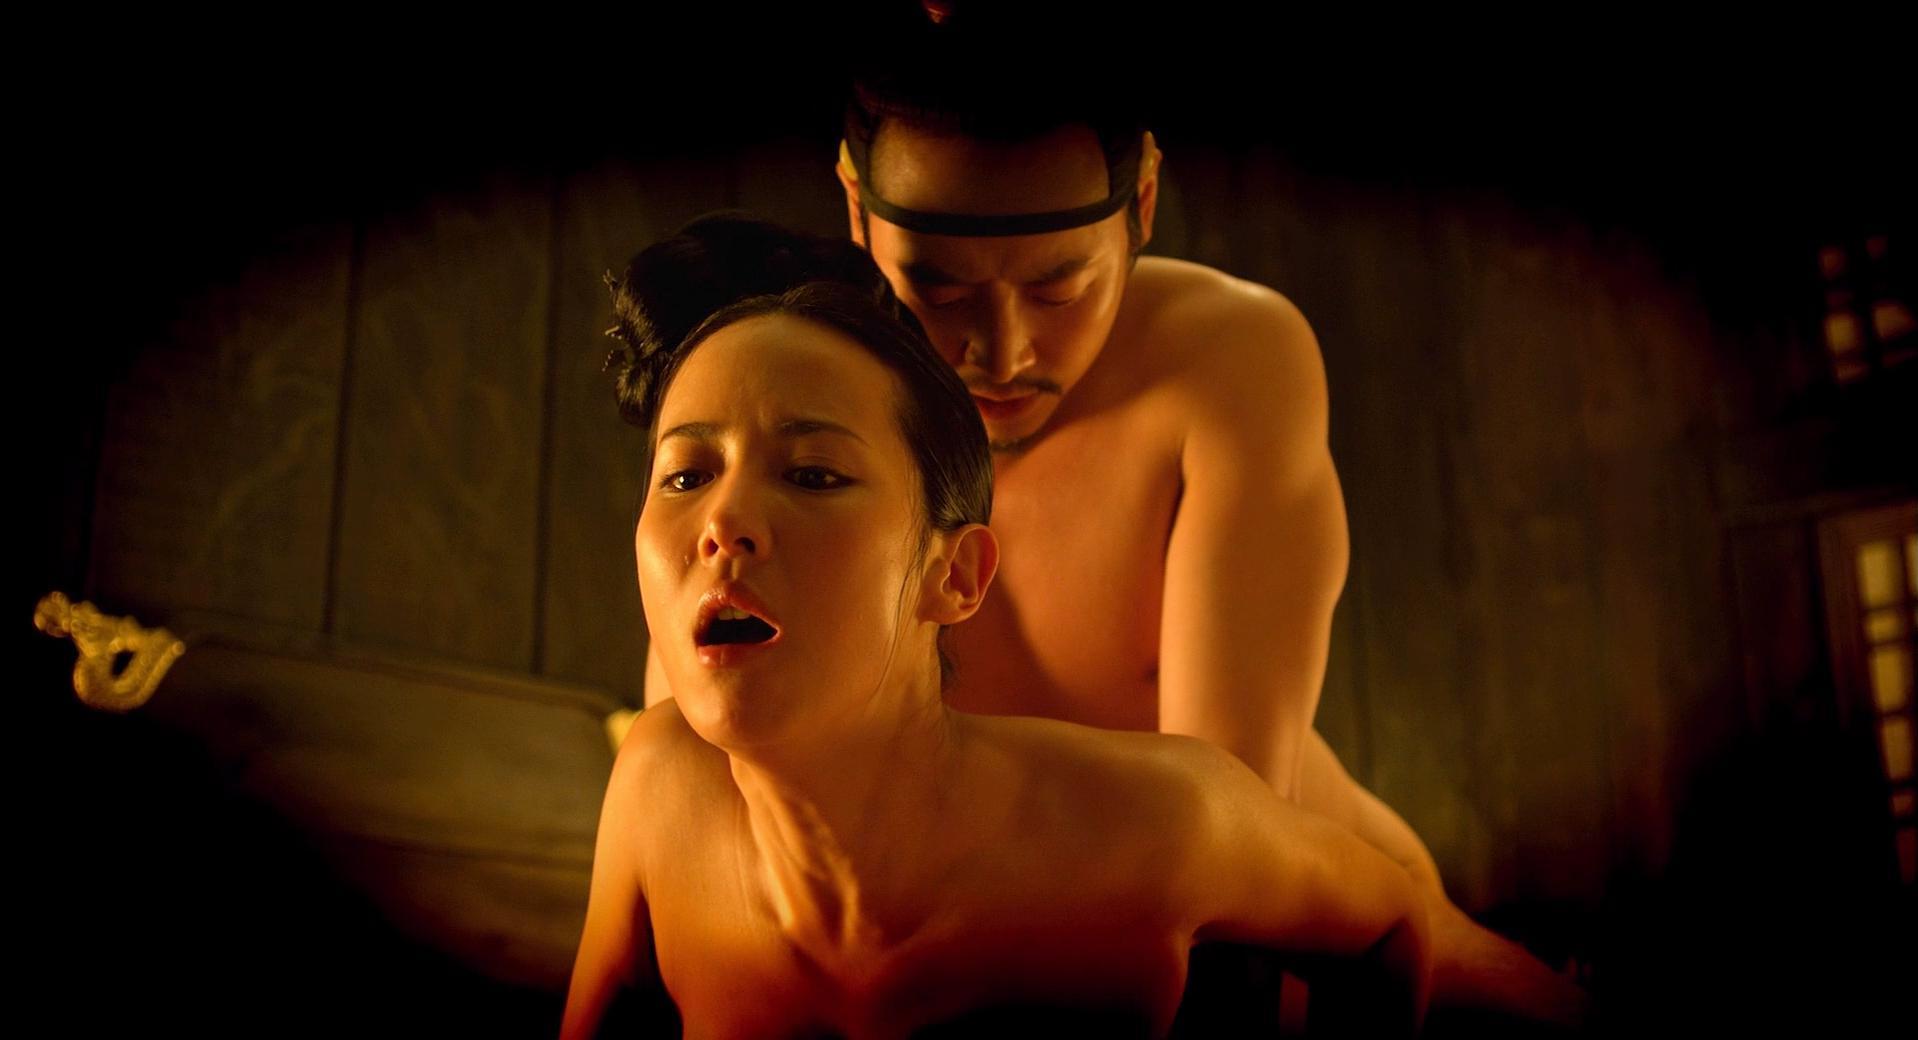 Concubine секс в део